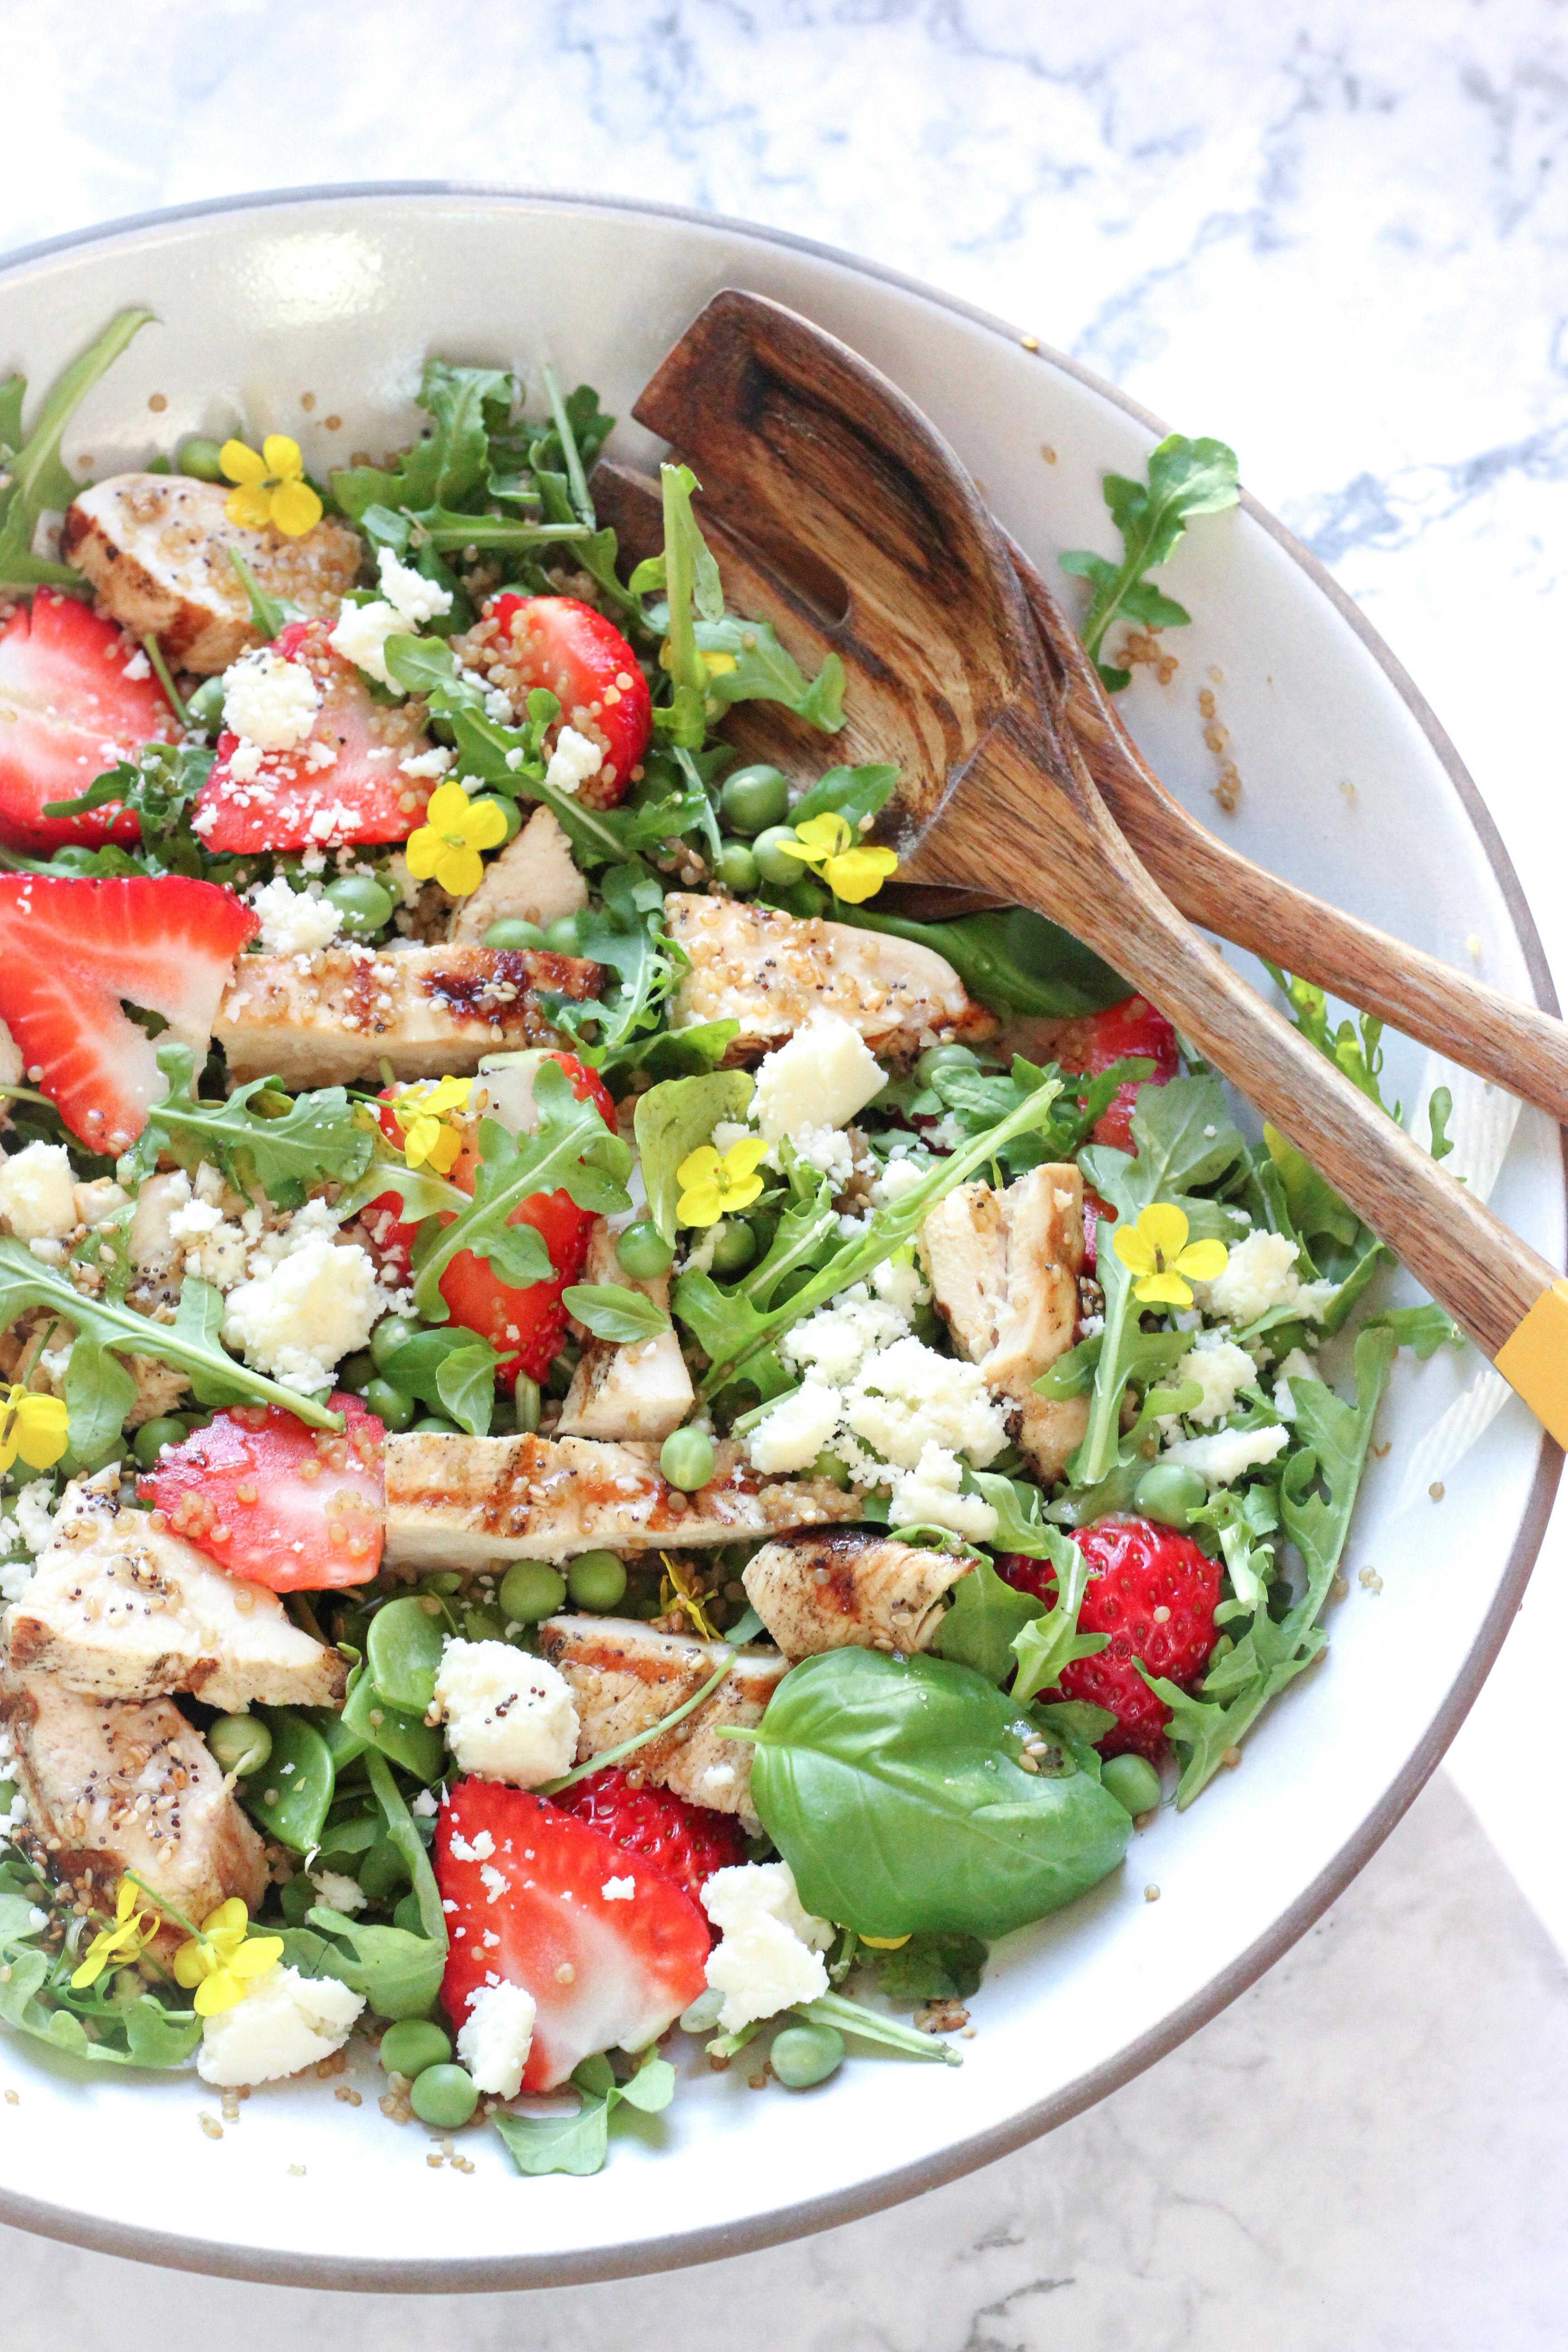 Grilled Chicken Salad with Strawberry, Arugula & Quinoa